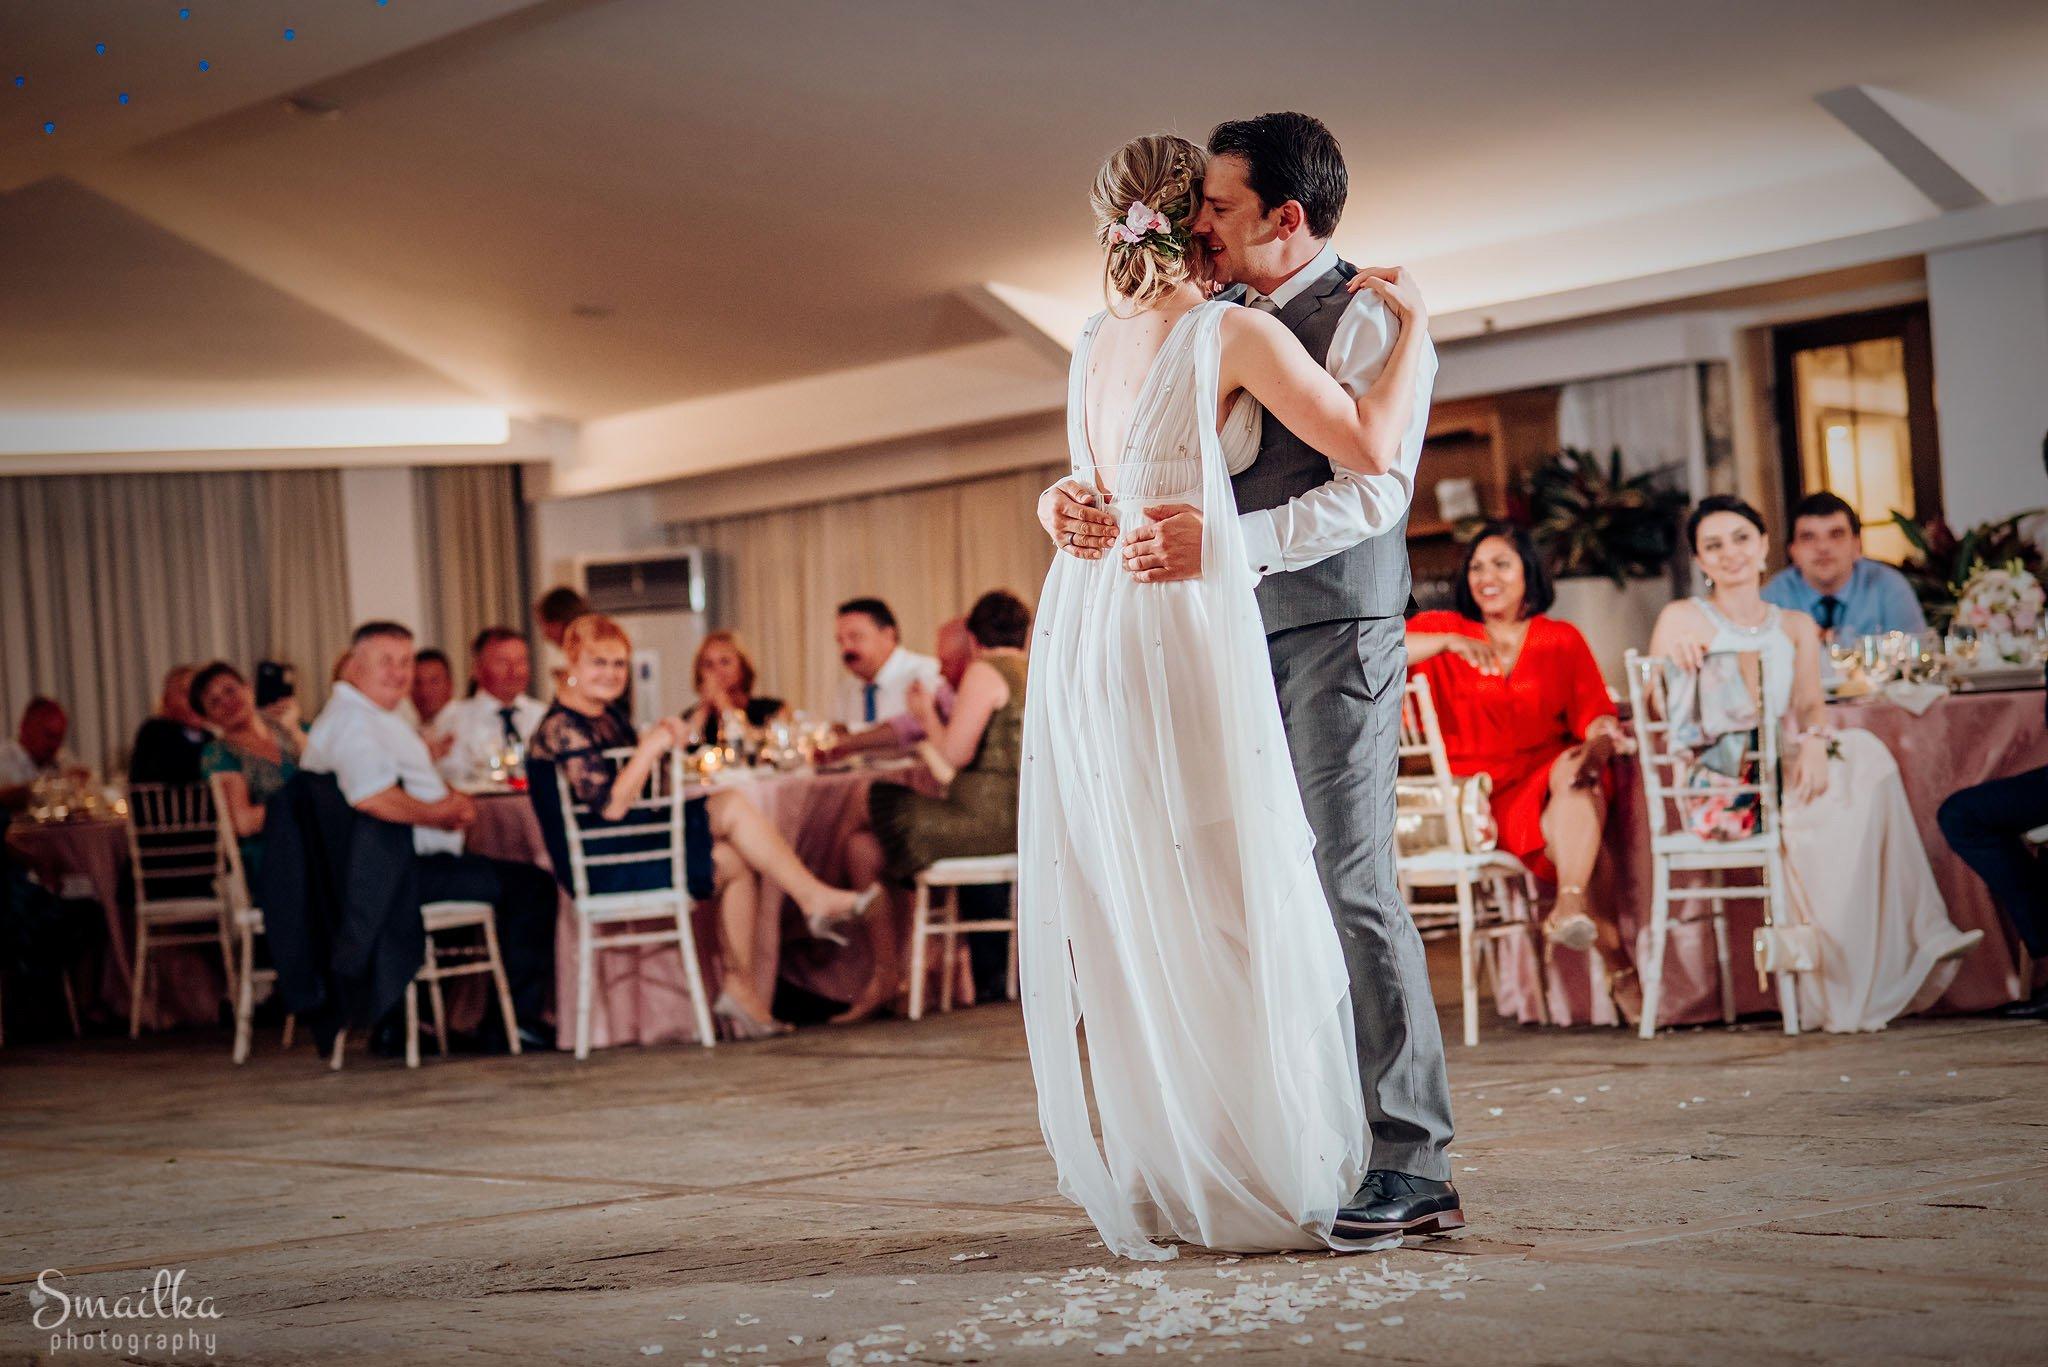 Ana and Boz first wedding dance at Black Sea rama